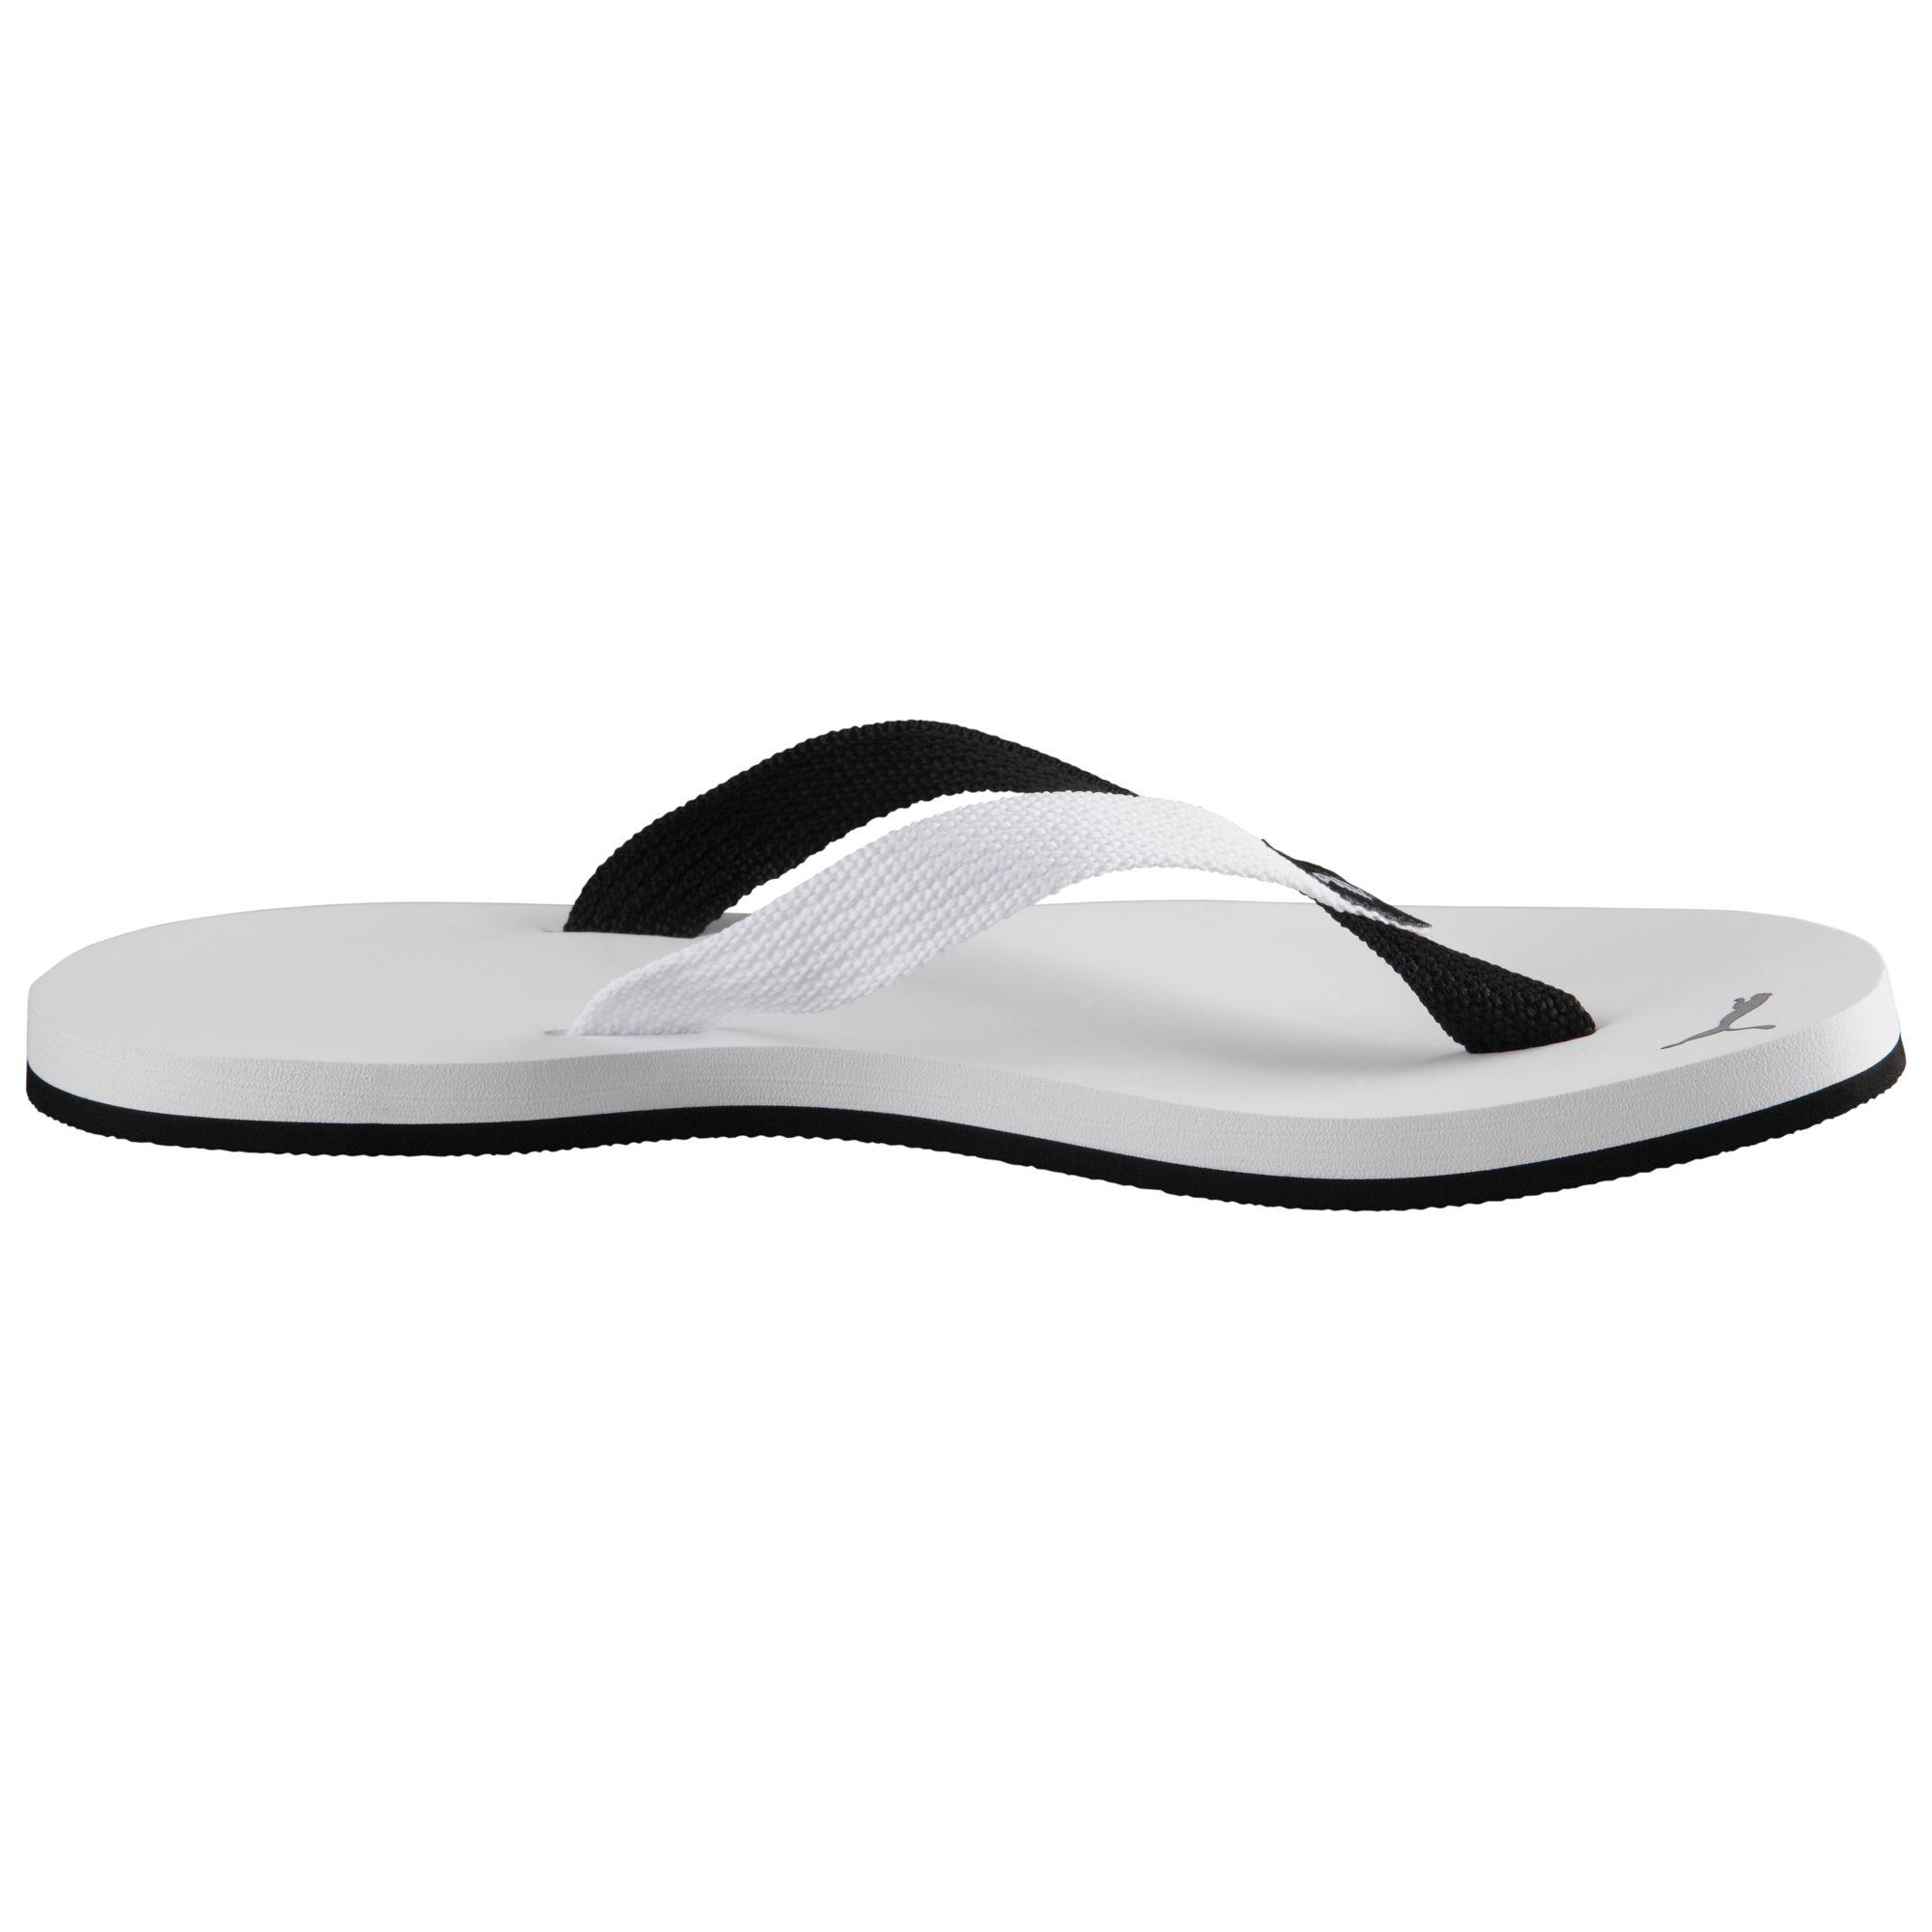 PUMA Dedo II UK Sandals Footwear Sandals Swimming Beach Unisex New ... 7e5a2d8c2